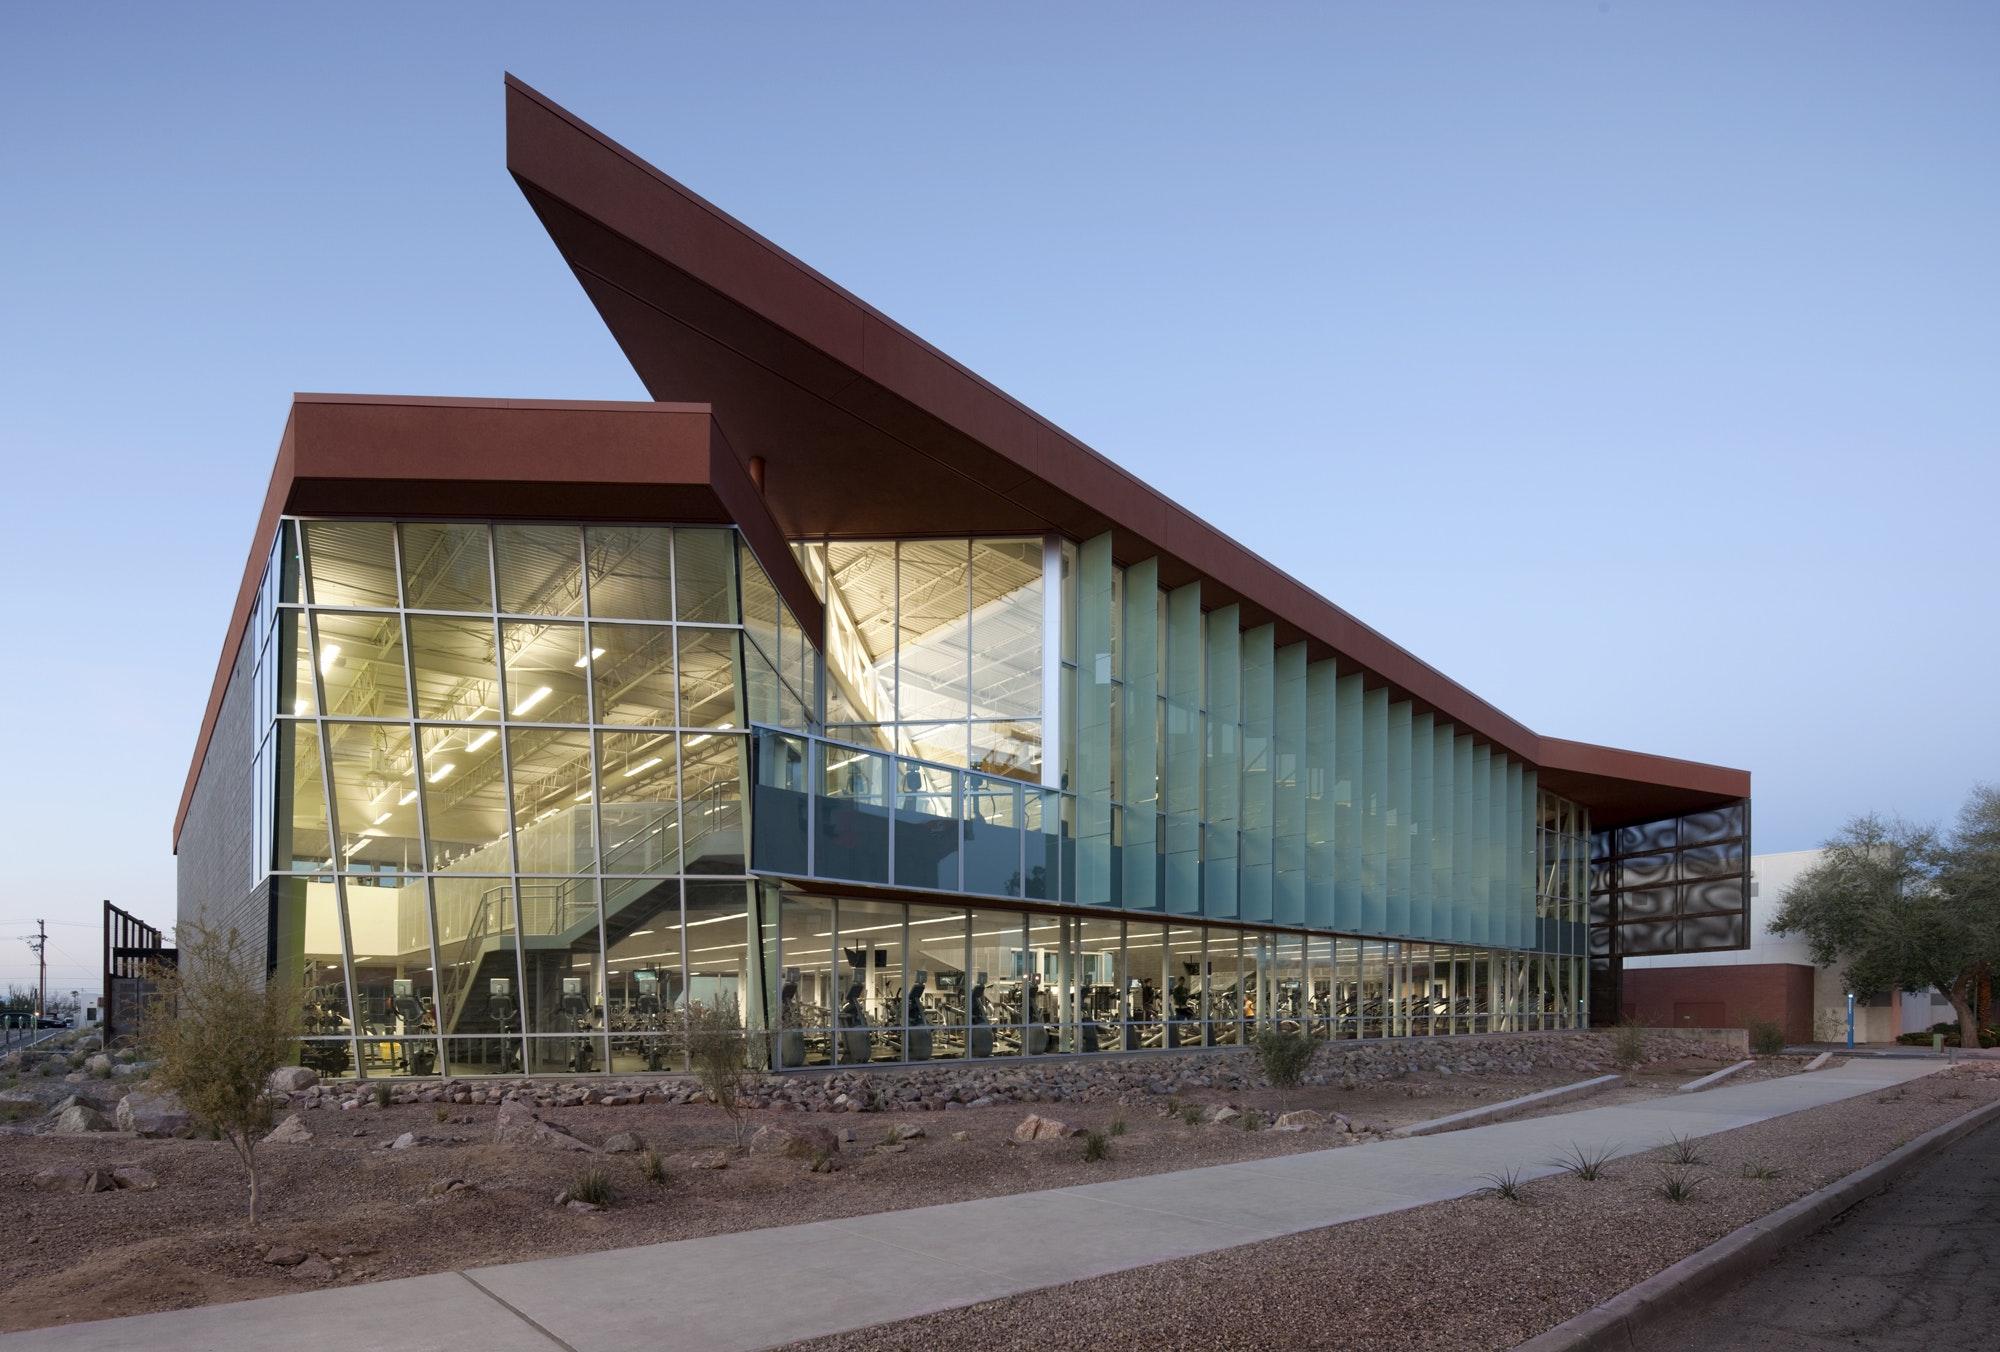 University Of Arizona Recreation Center Expansion